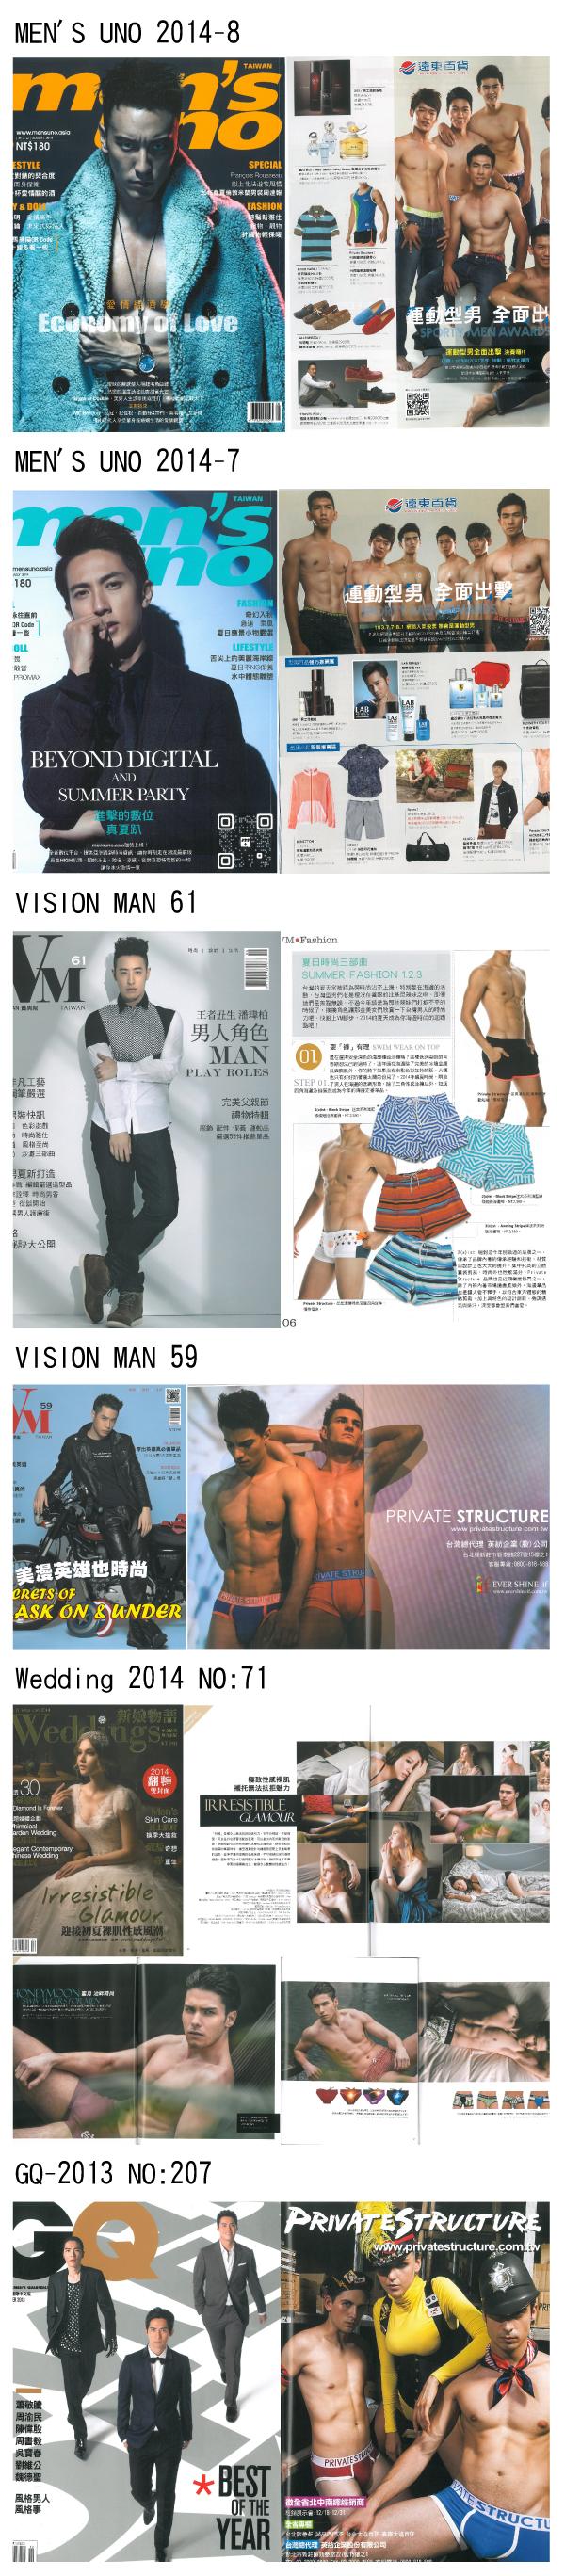 http://www.momoshop.com.tw/expertimg/0003/737/823/ps-magazine.jpg?t=1448902199